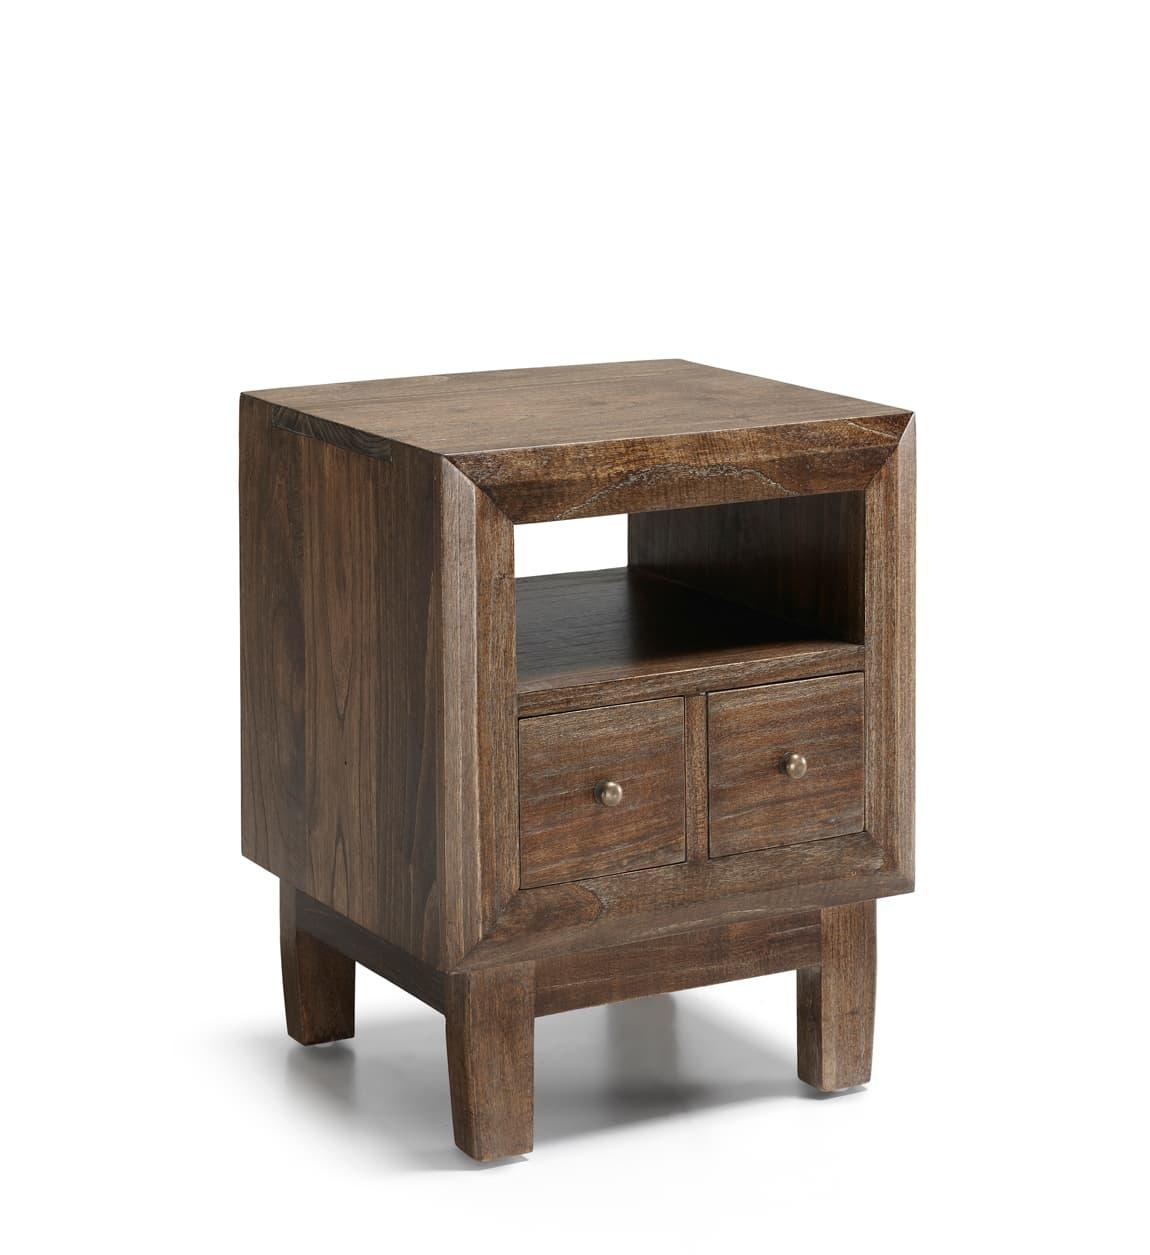 Noptiera din lemn cu 2 sertare, Sindor Natur, l45xA40xH55 cm somproduct.ro